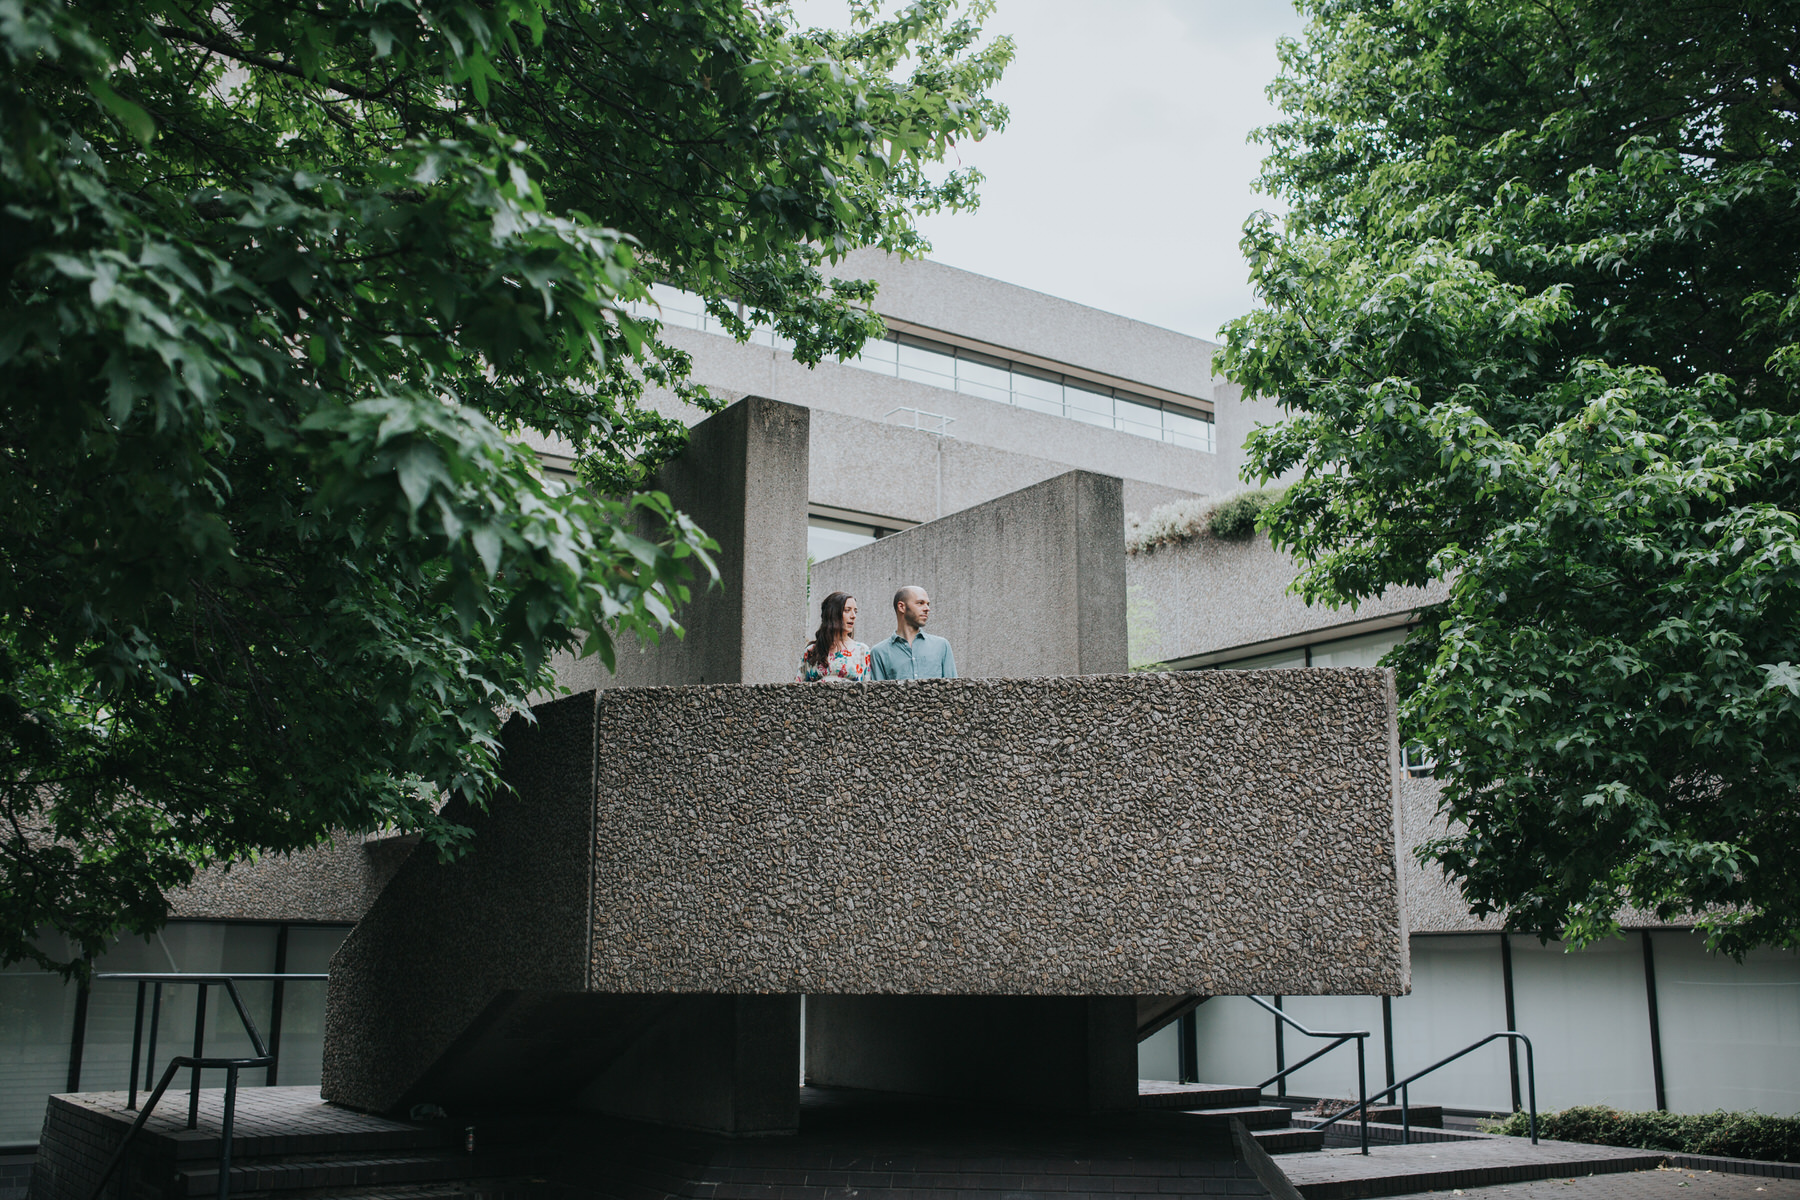 44-couple portrait shoot brutalist architecture green trees Southbank.jpg